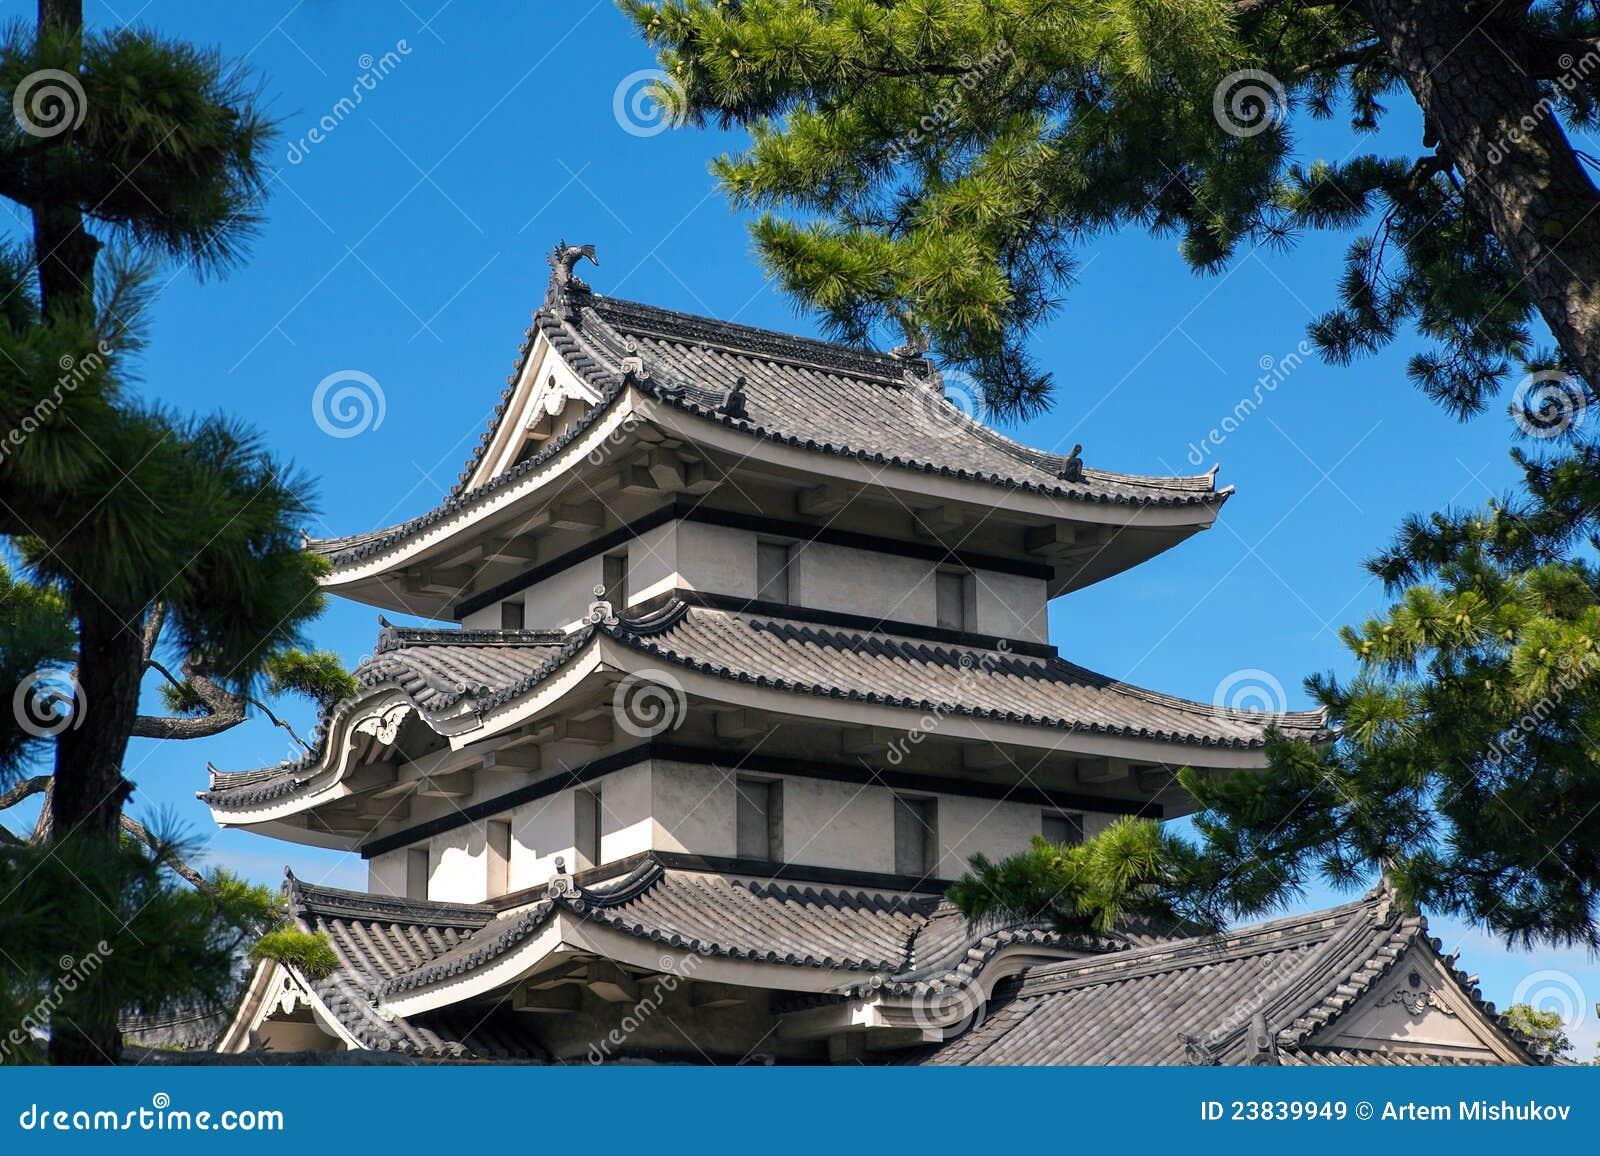 Japanisches Dach japanisches schloss dach stockbild bild draußen 23839949